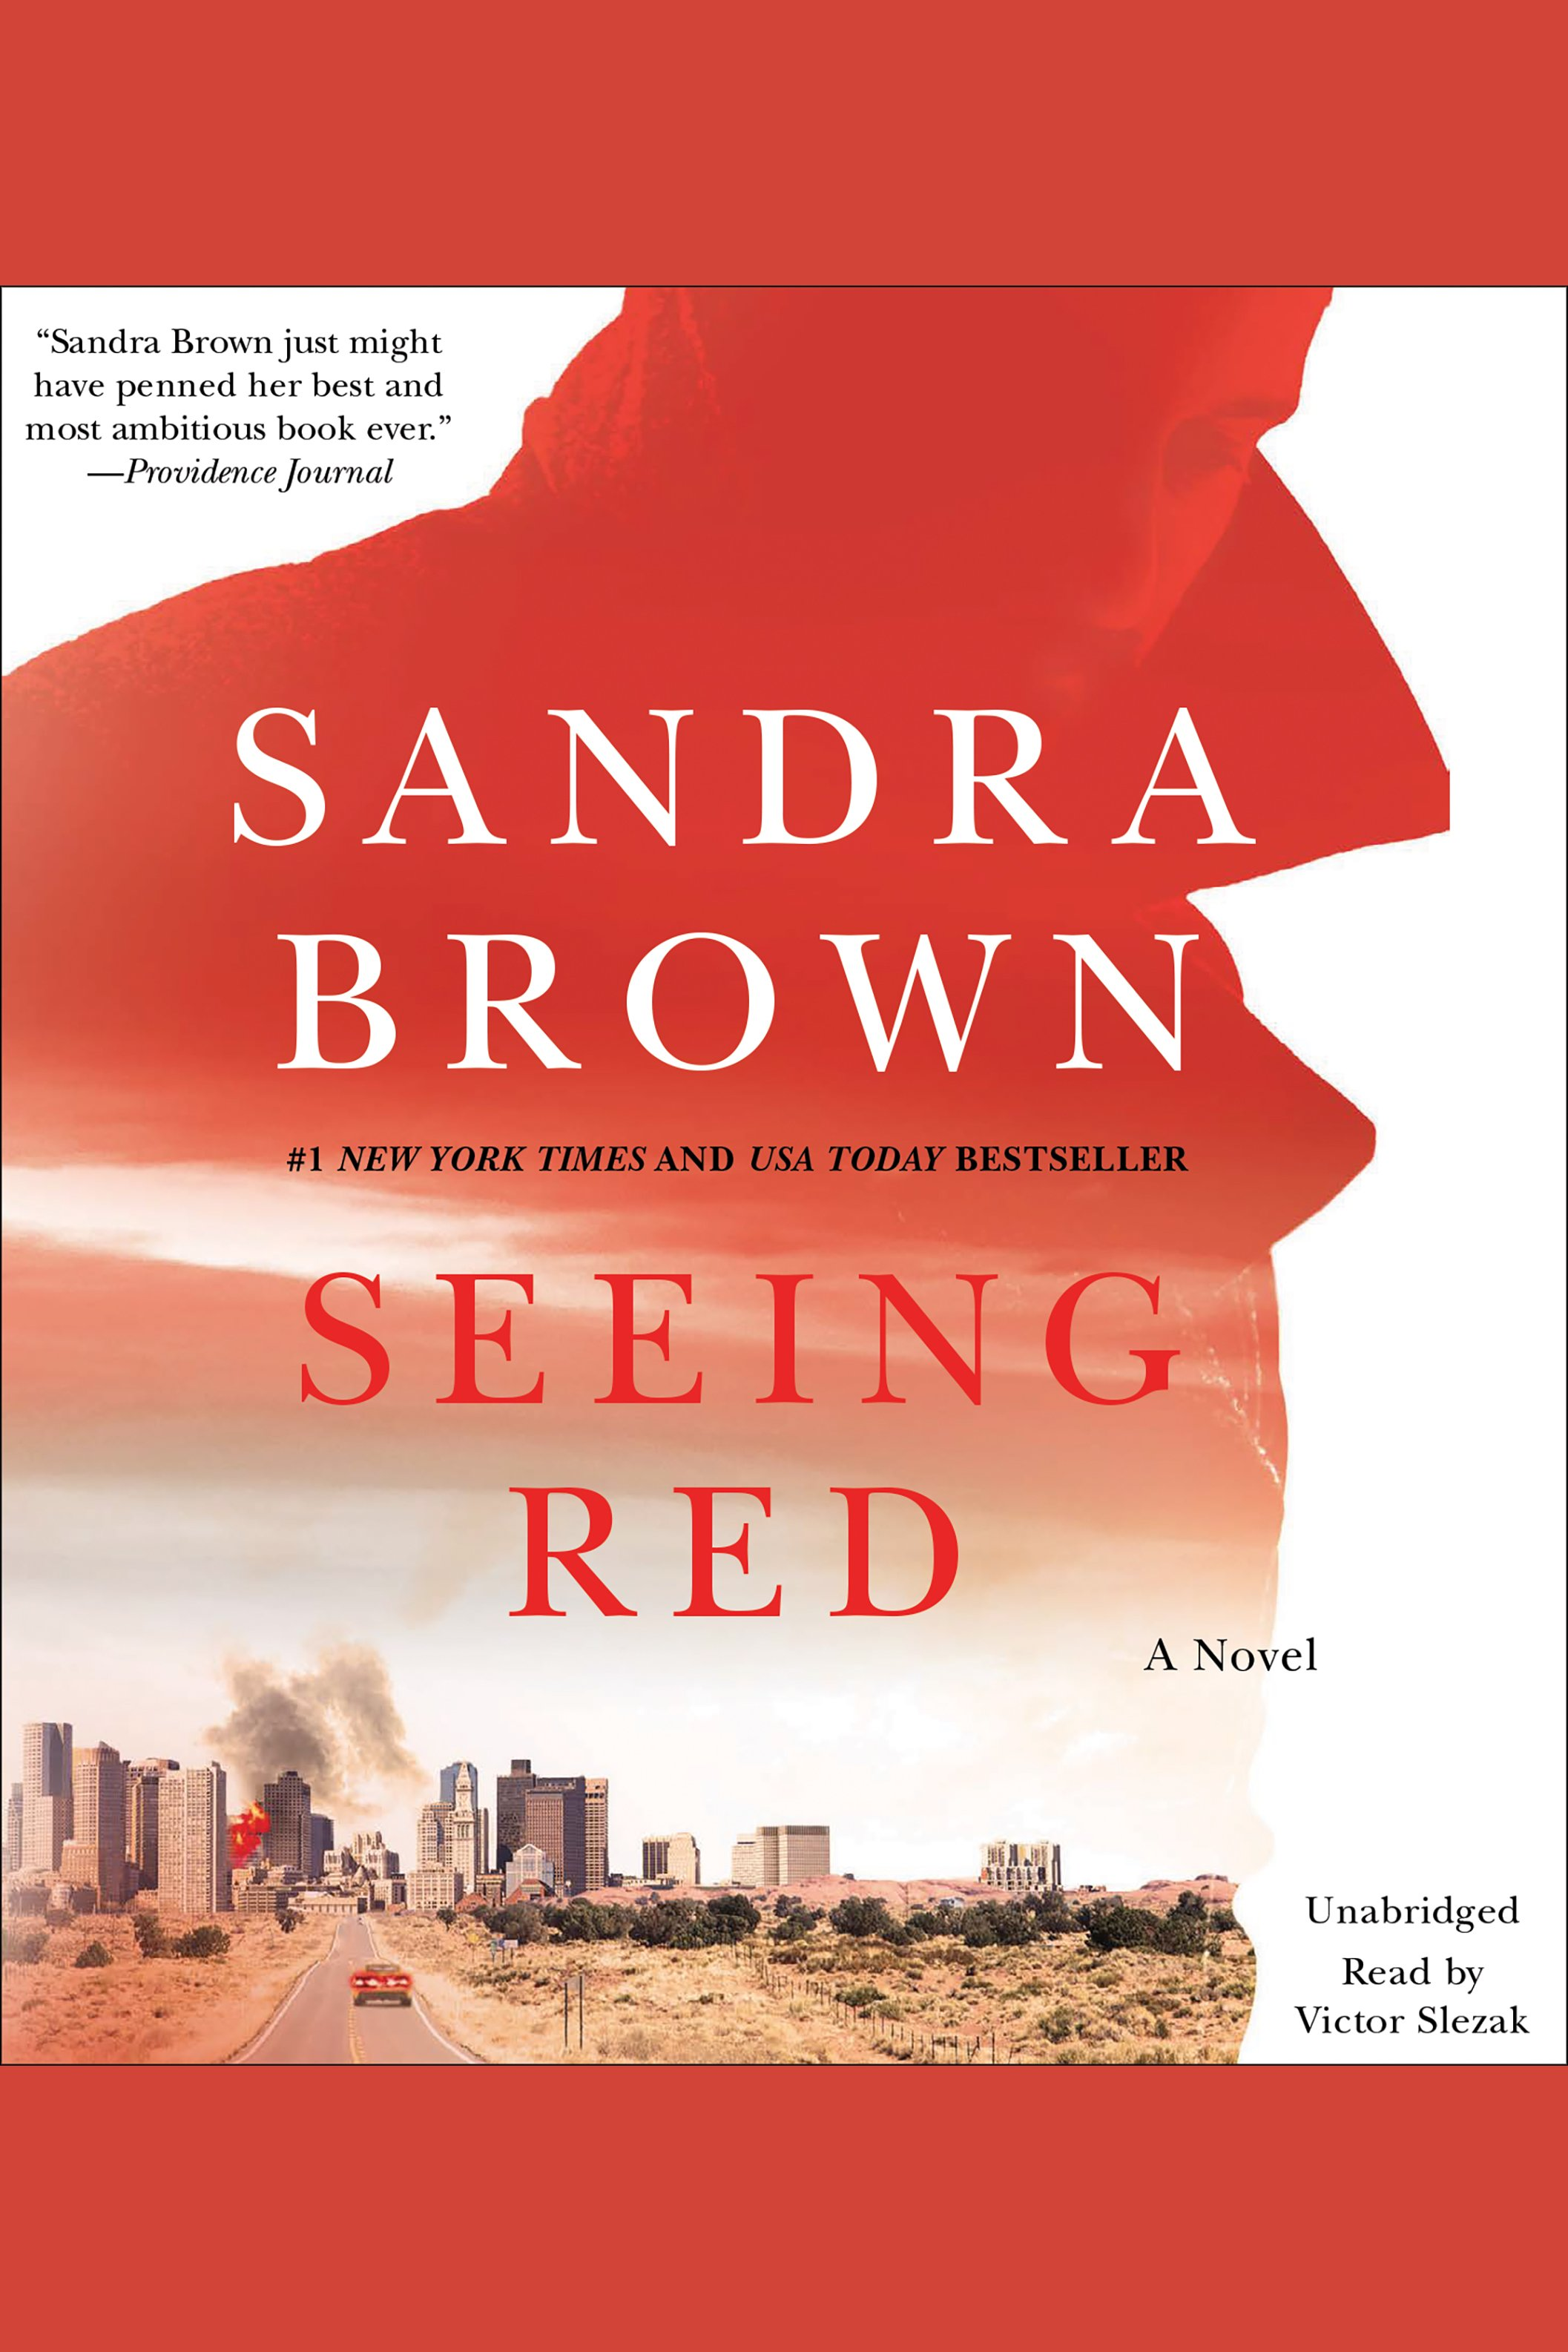 Seeing Red [AUDIOBOOK]